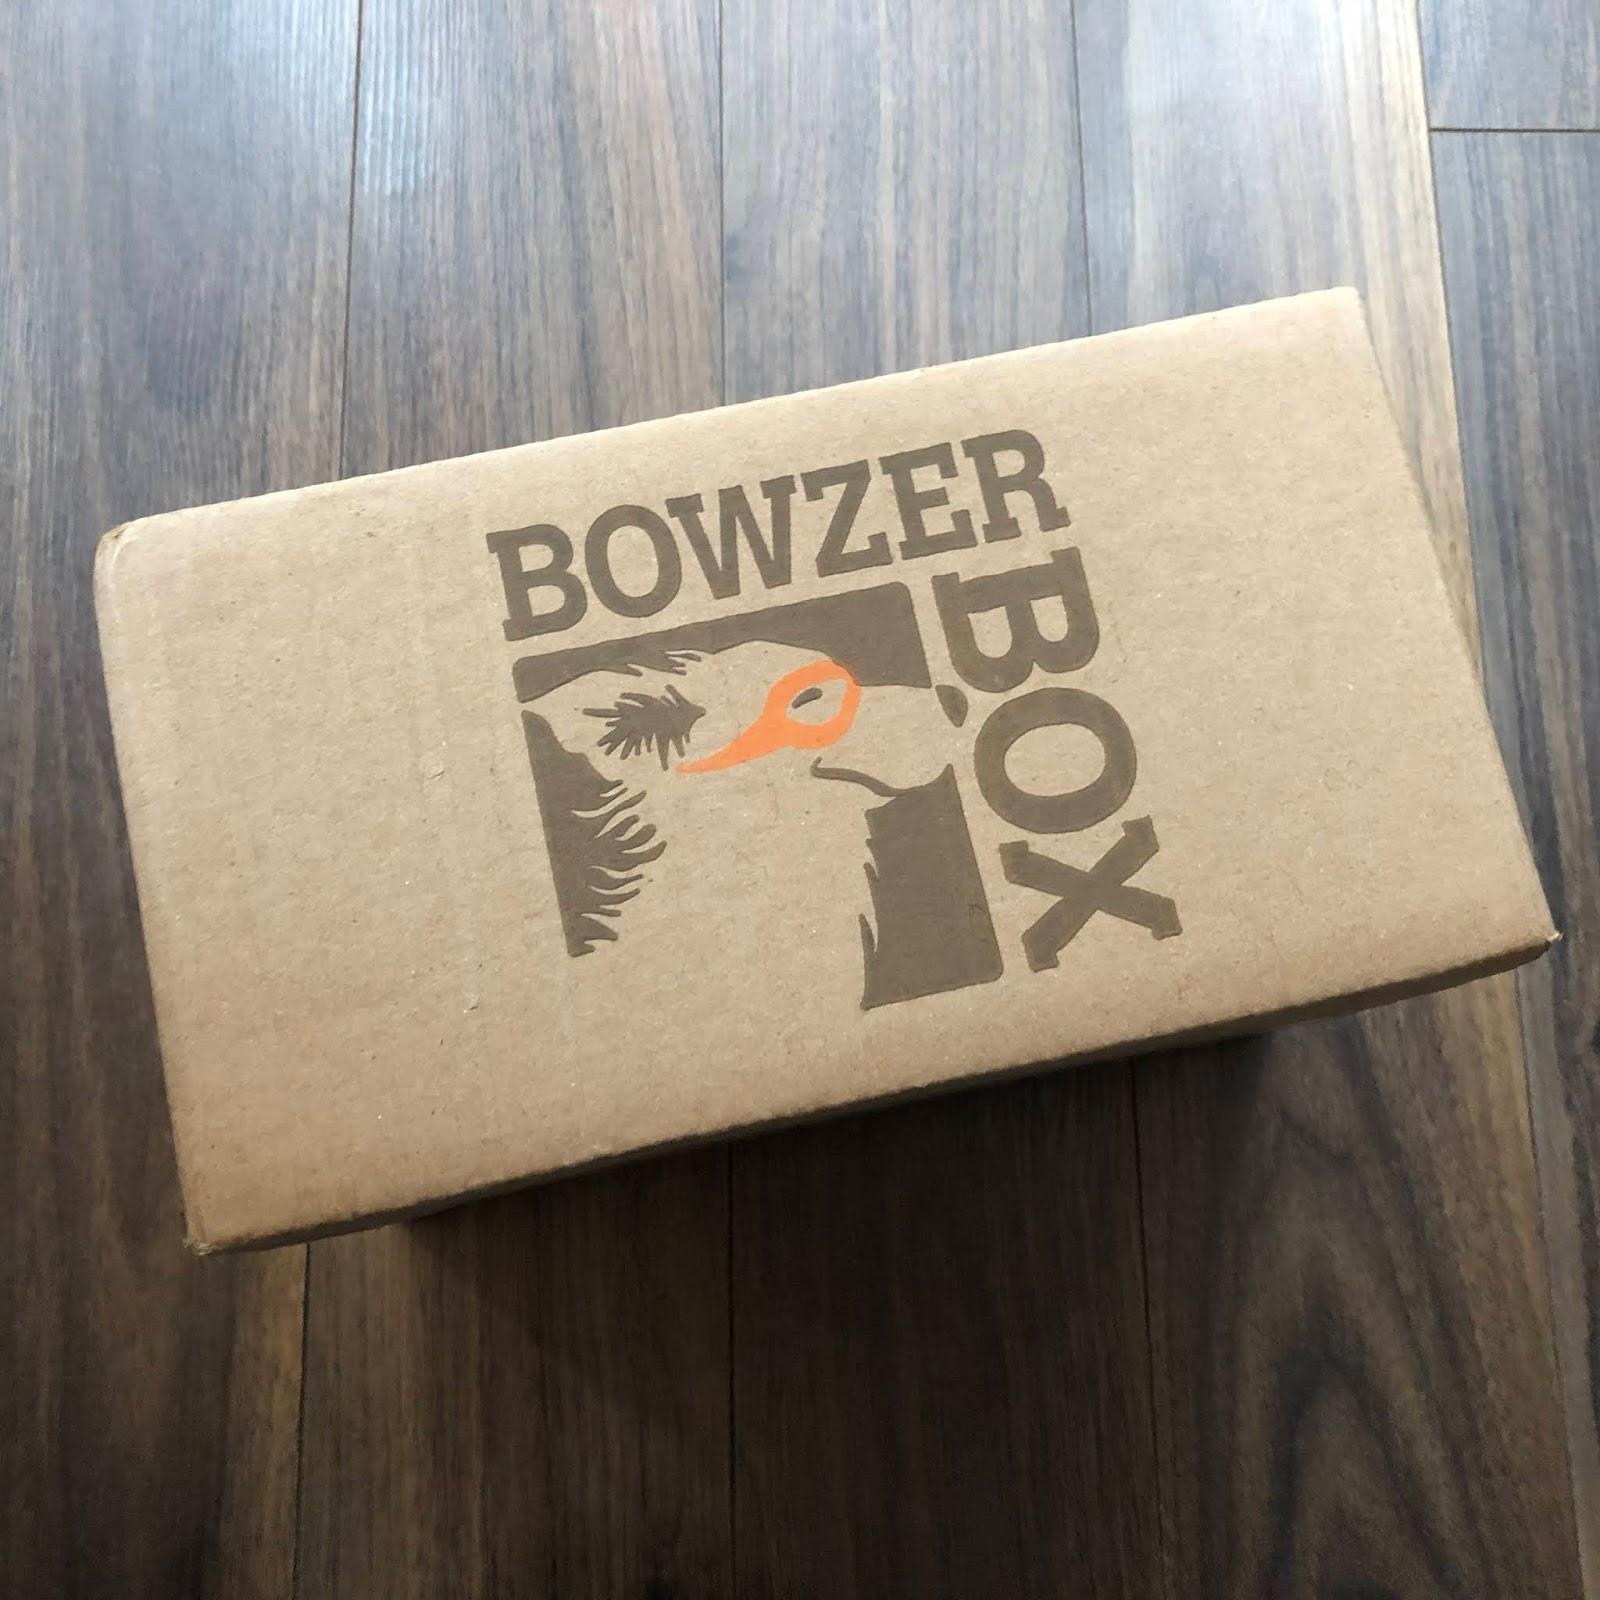 Bowzer Box Review December 2018 Canadian Pet Subscription Box